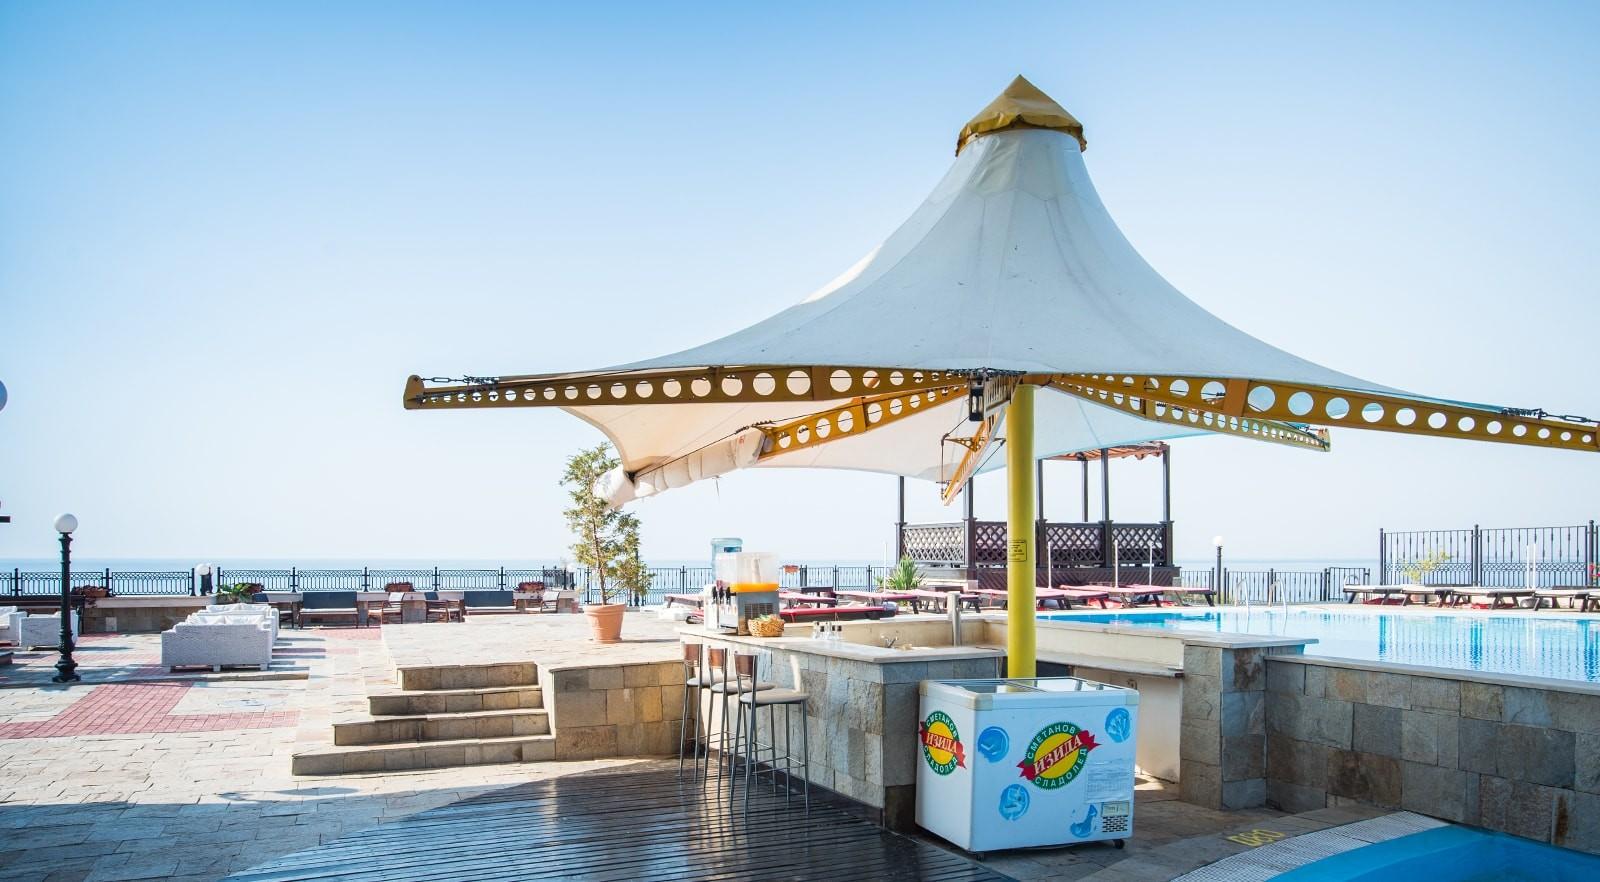 Хотел Цезар Палас 4* - бар на басейна